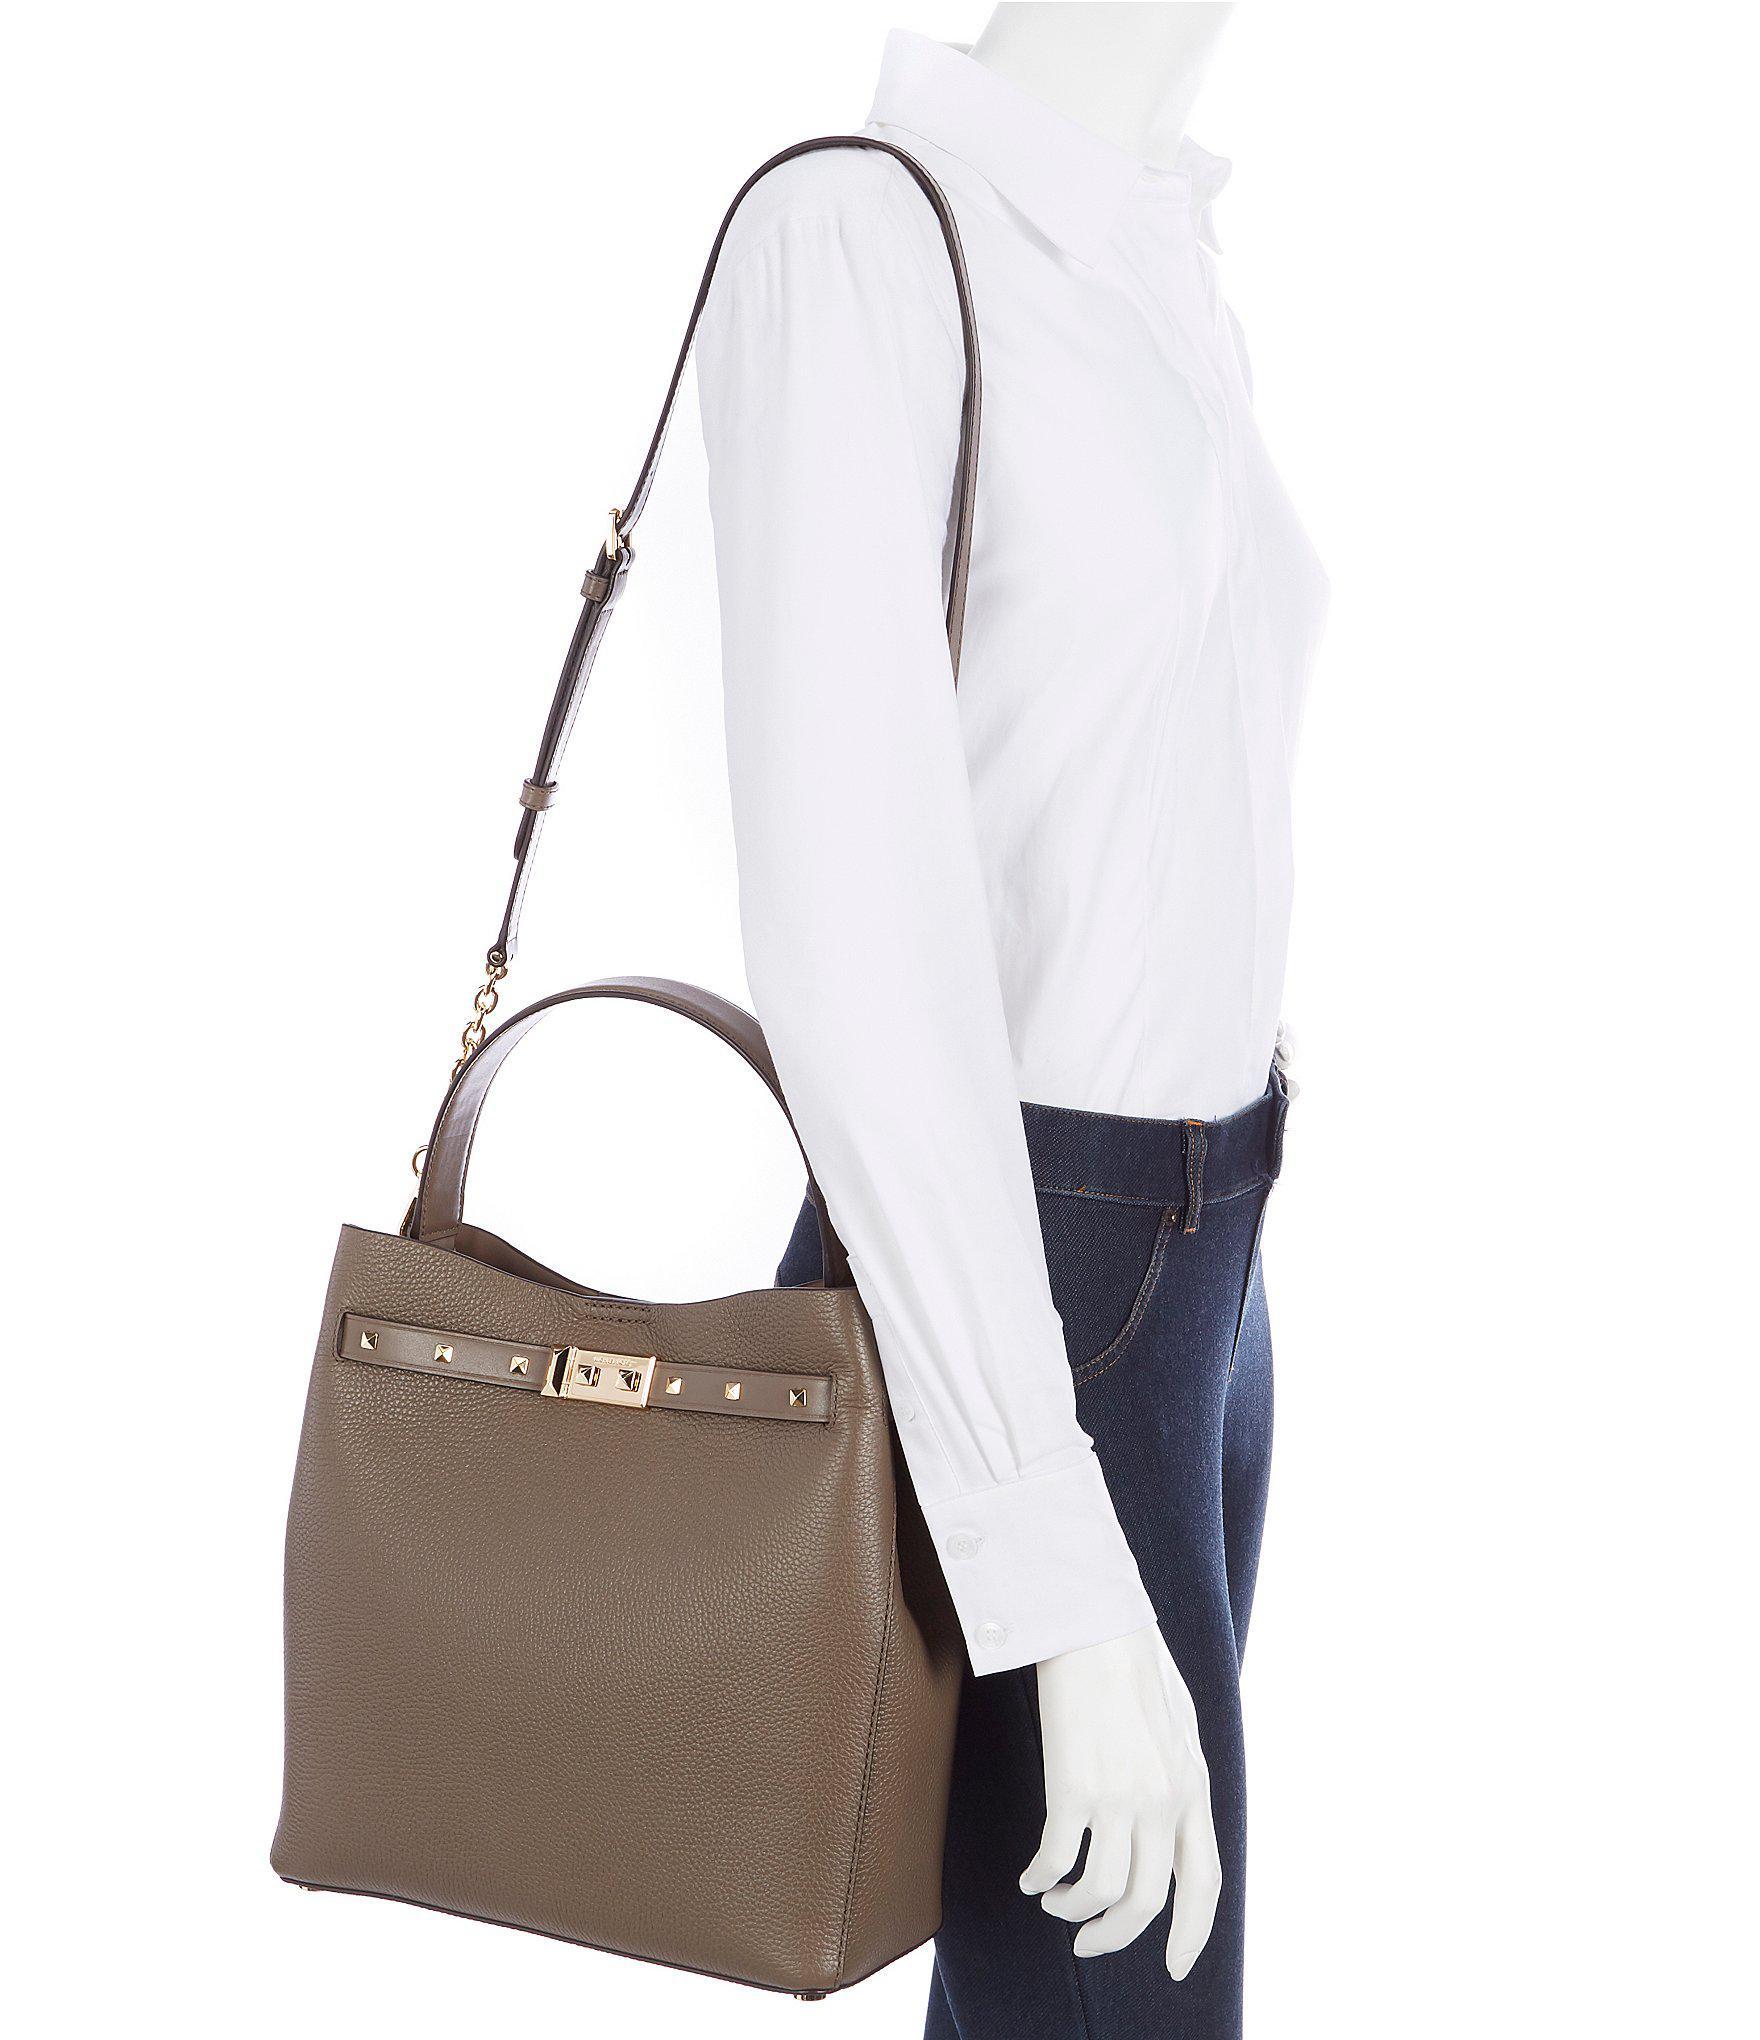 8e3e8fb27c75 Lyst - MICHAEL Michael Kors Addison Medium Bucket Bag